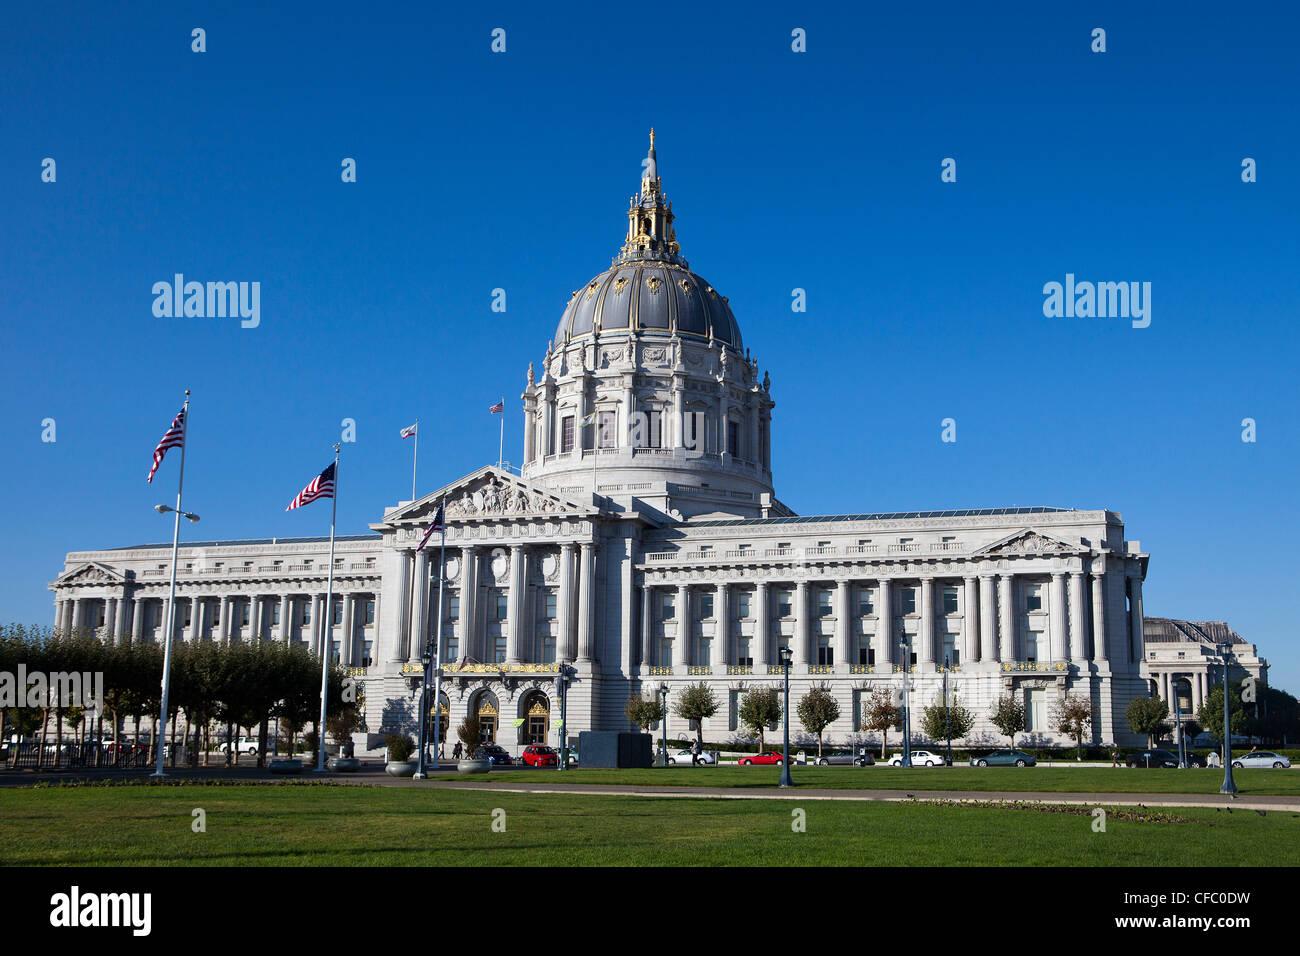 USA, USA, Amerika, Kalifornien, San Francisco, Stadt, Rathaus, Avenue, Rathaus, Clear, Kuppel, Regierung, m Stockfoto